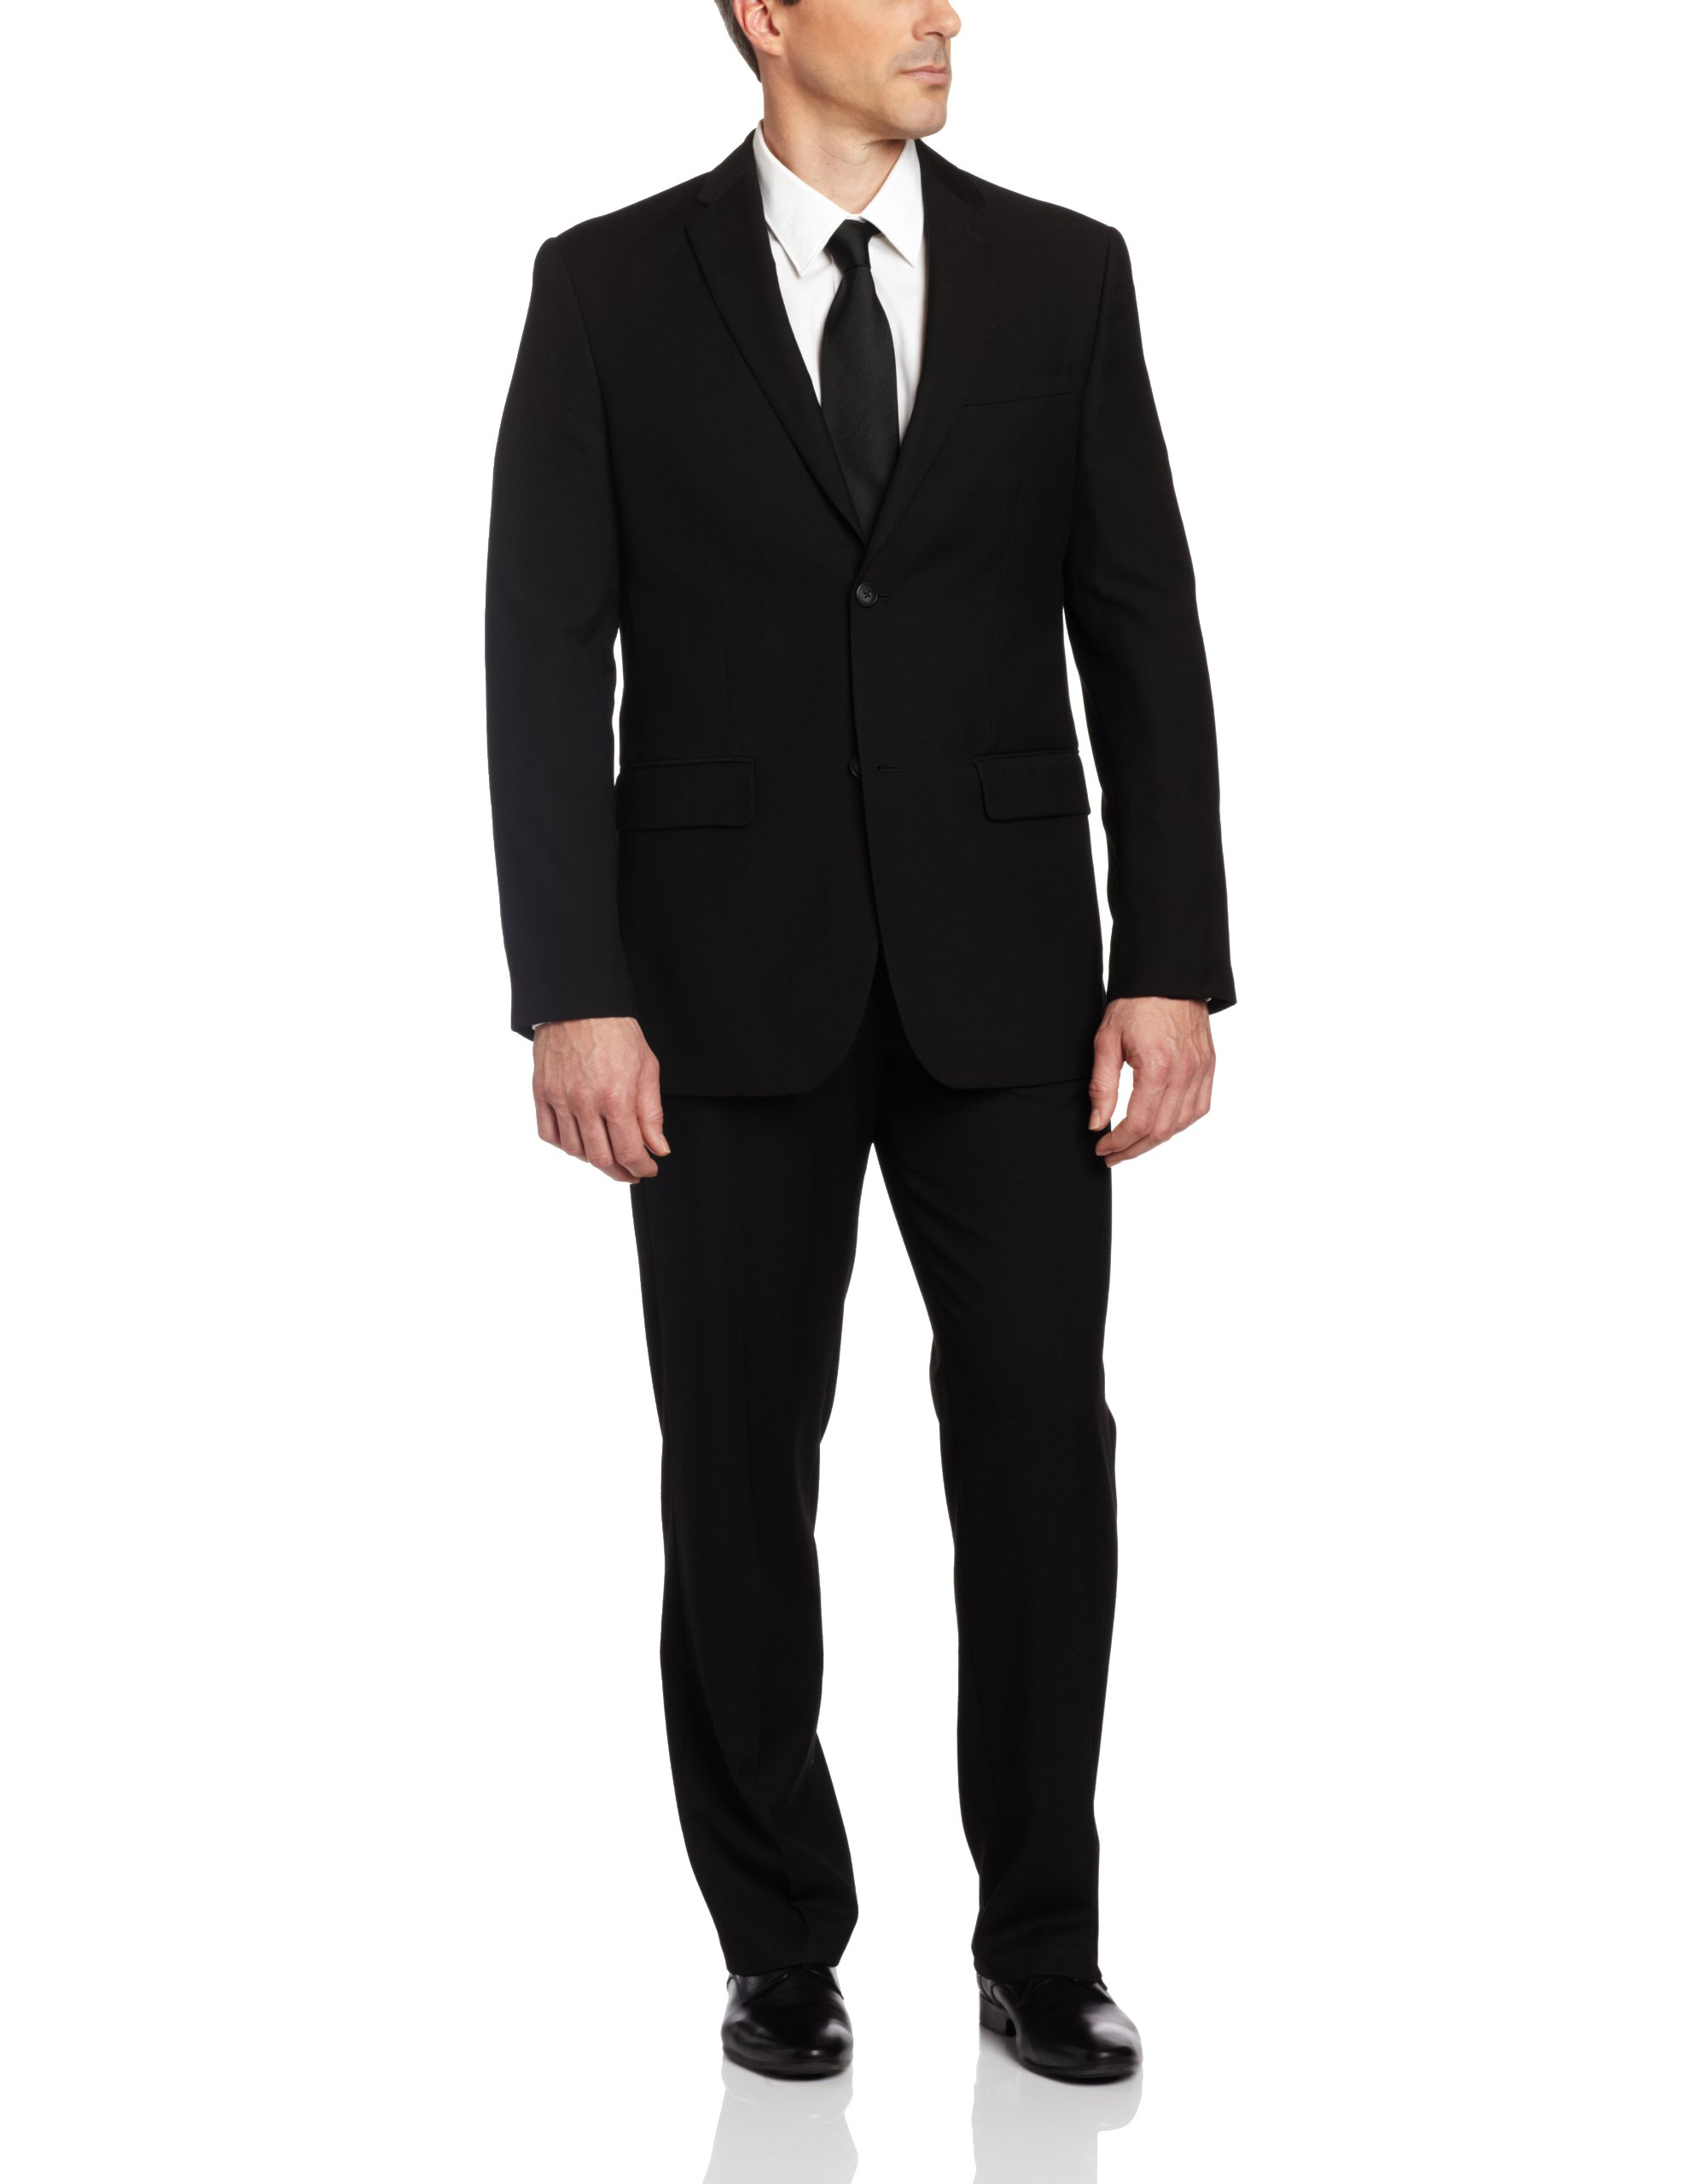 Perry Ellis Men's Solid Jacket,Black,38 Regular